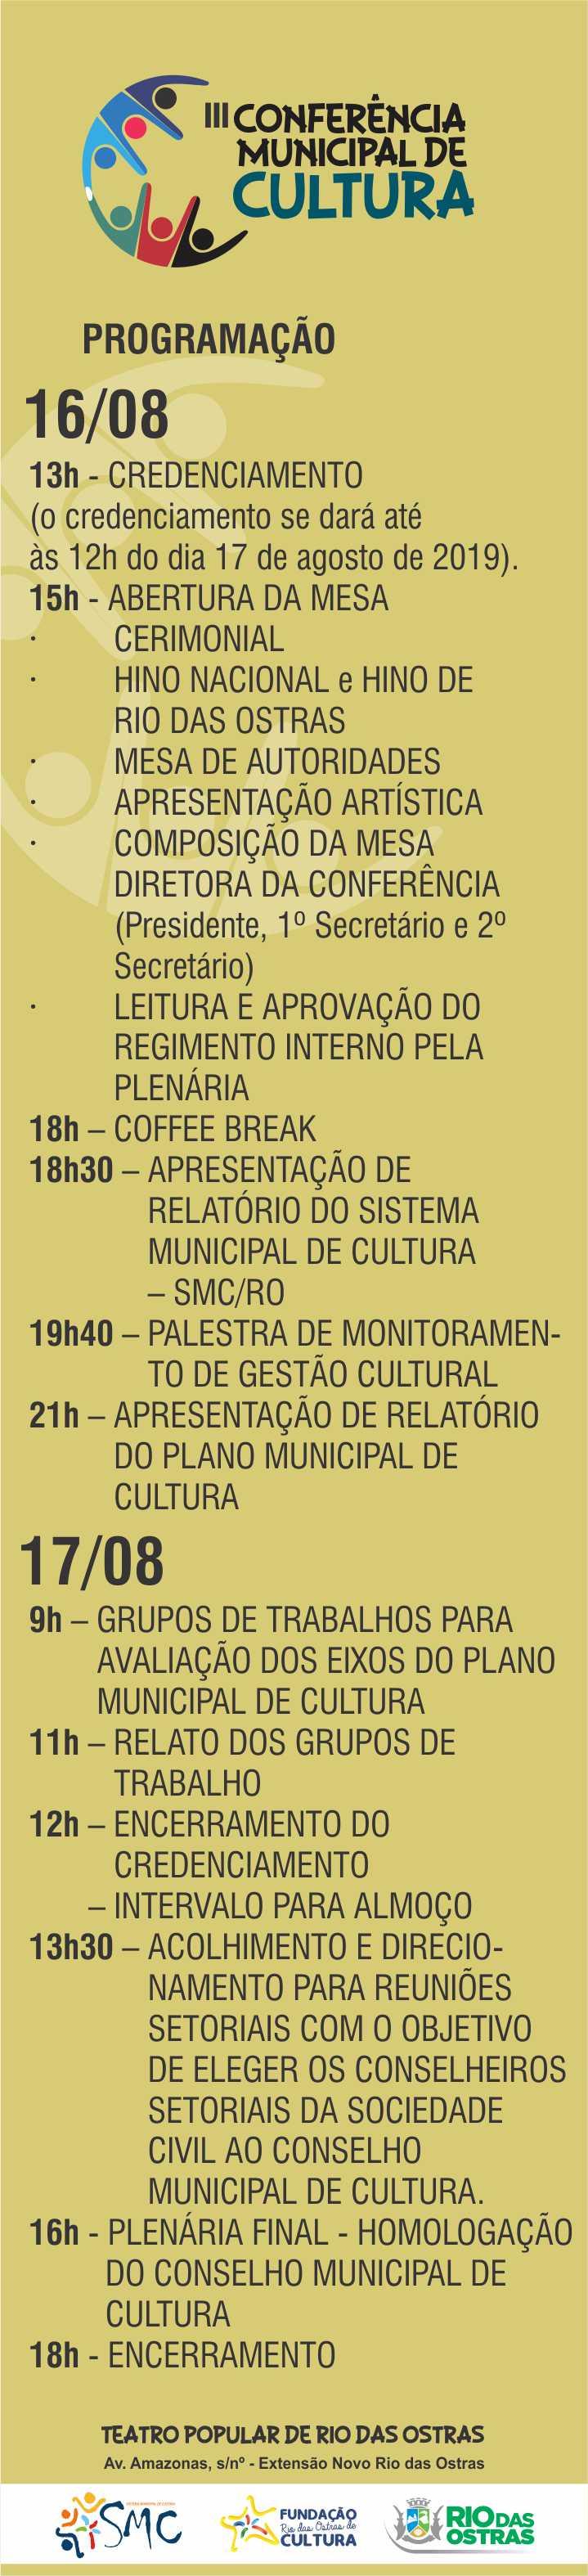 III Conferência Municipal de Cultura